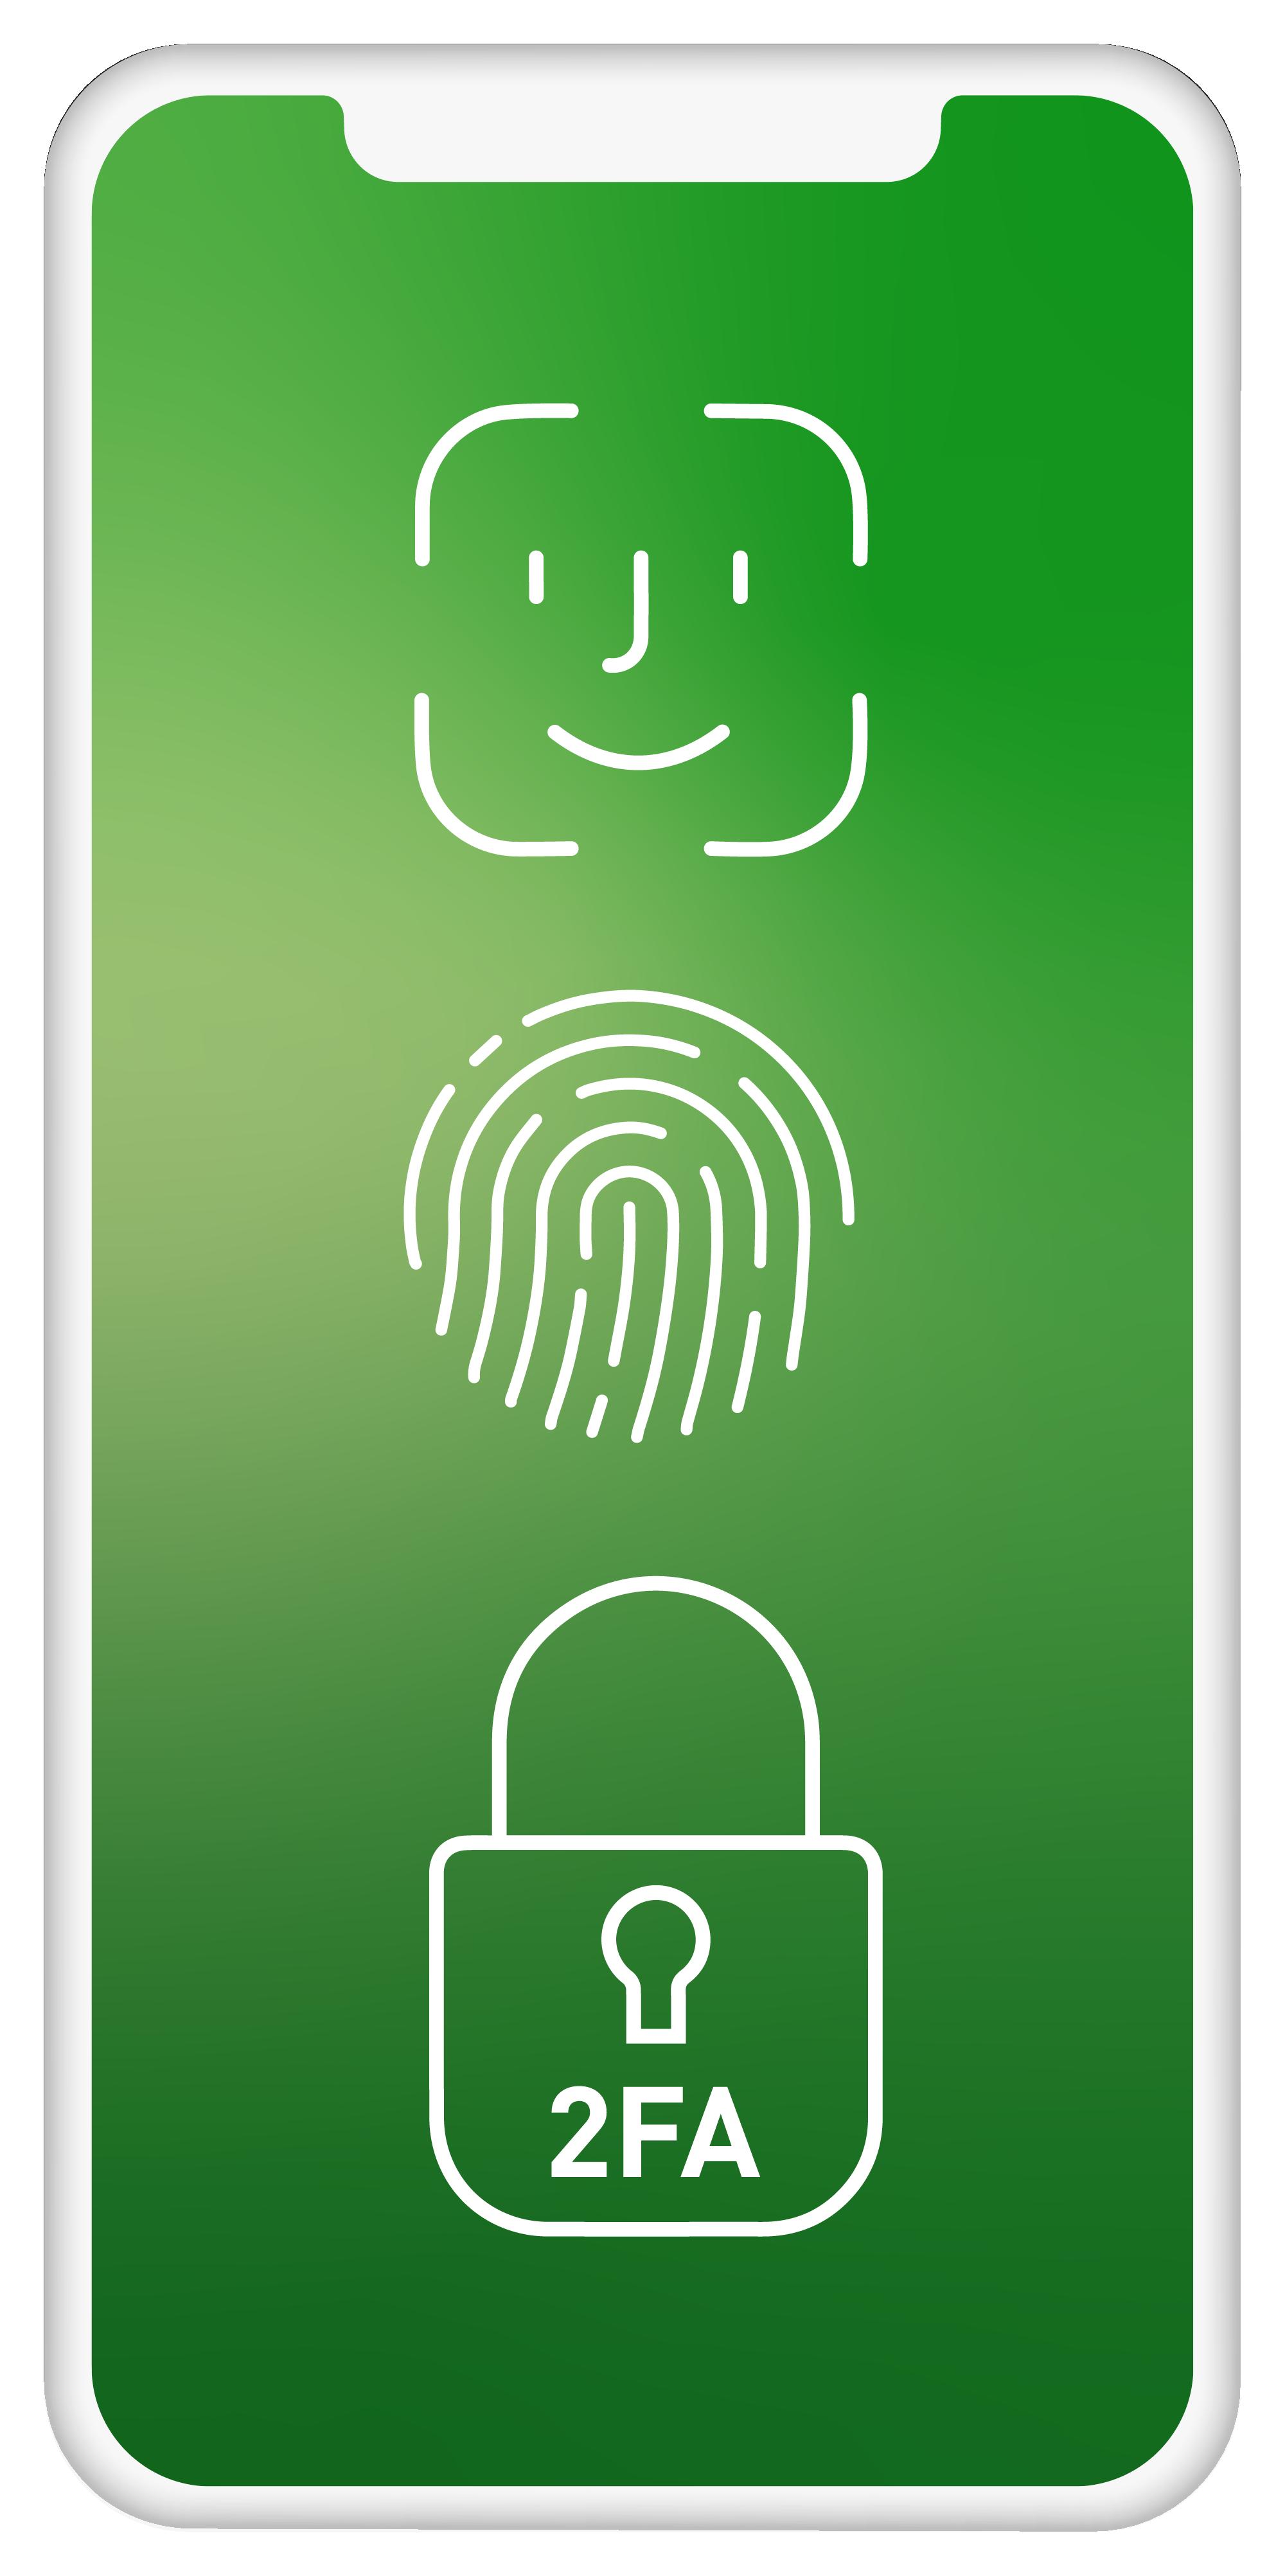 //www.id1.de/wp-content/uploads/2020/12/Security.png